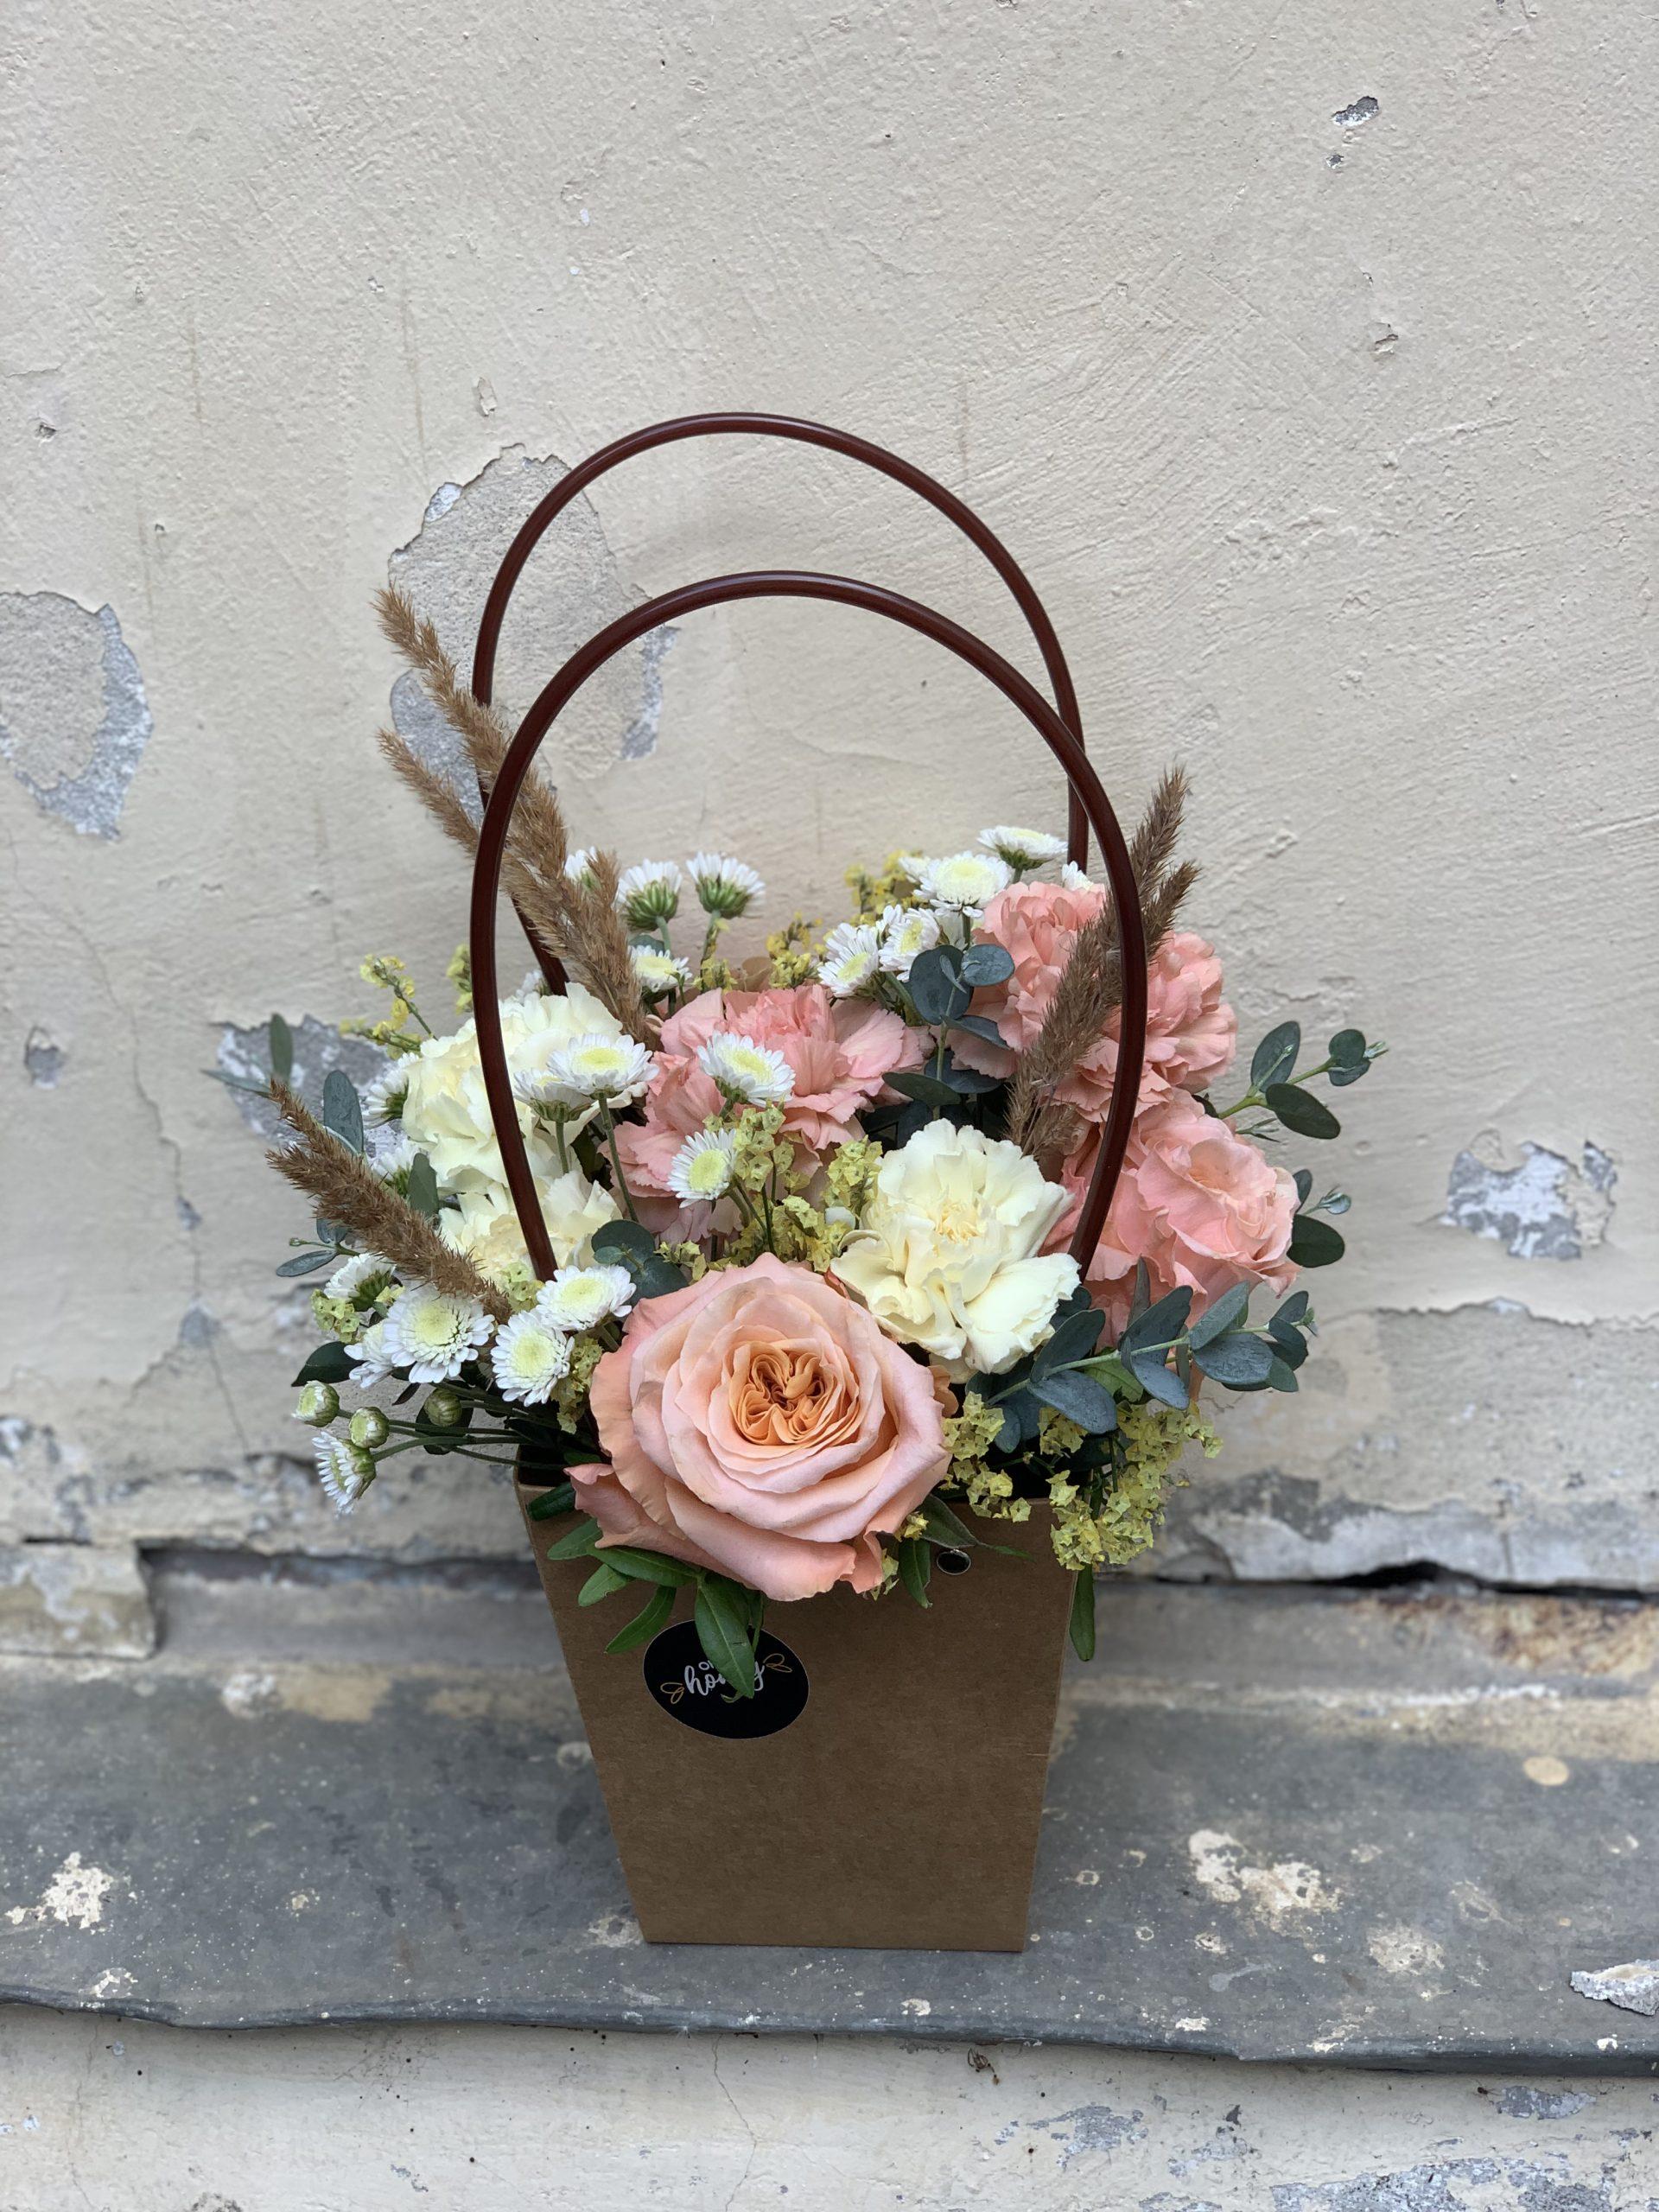 Осенняя коллекция. Сумочка с цветами